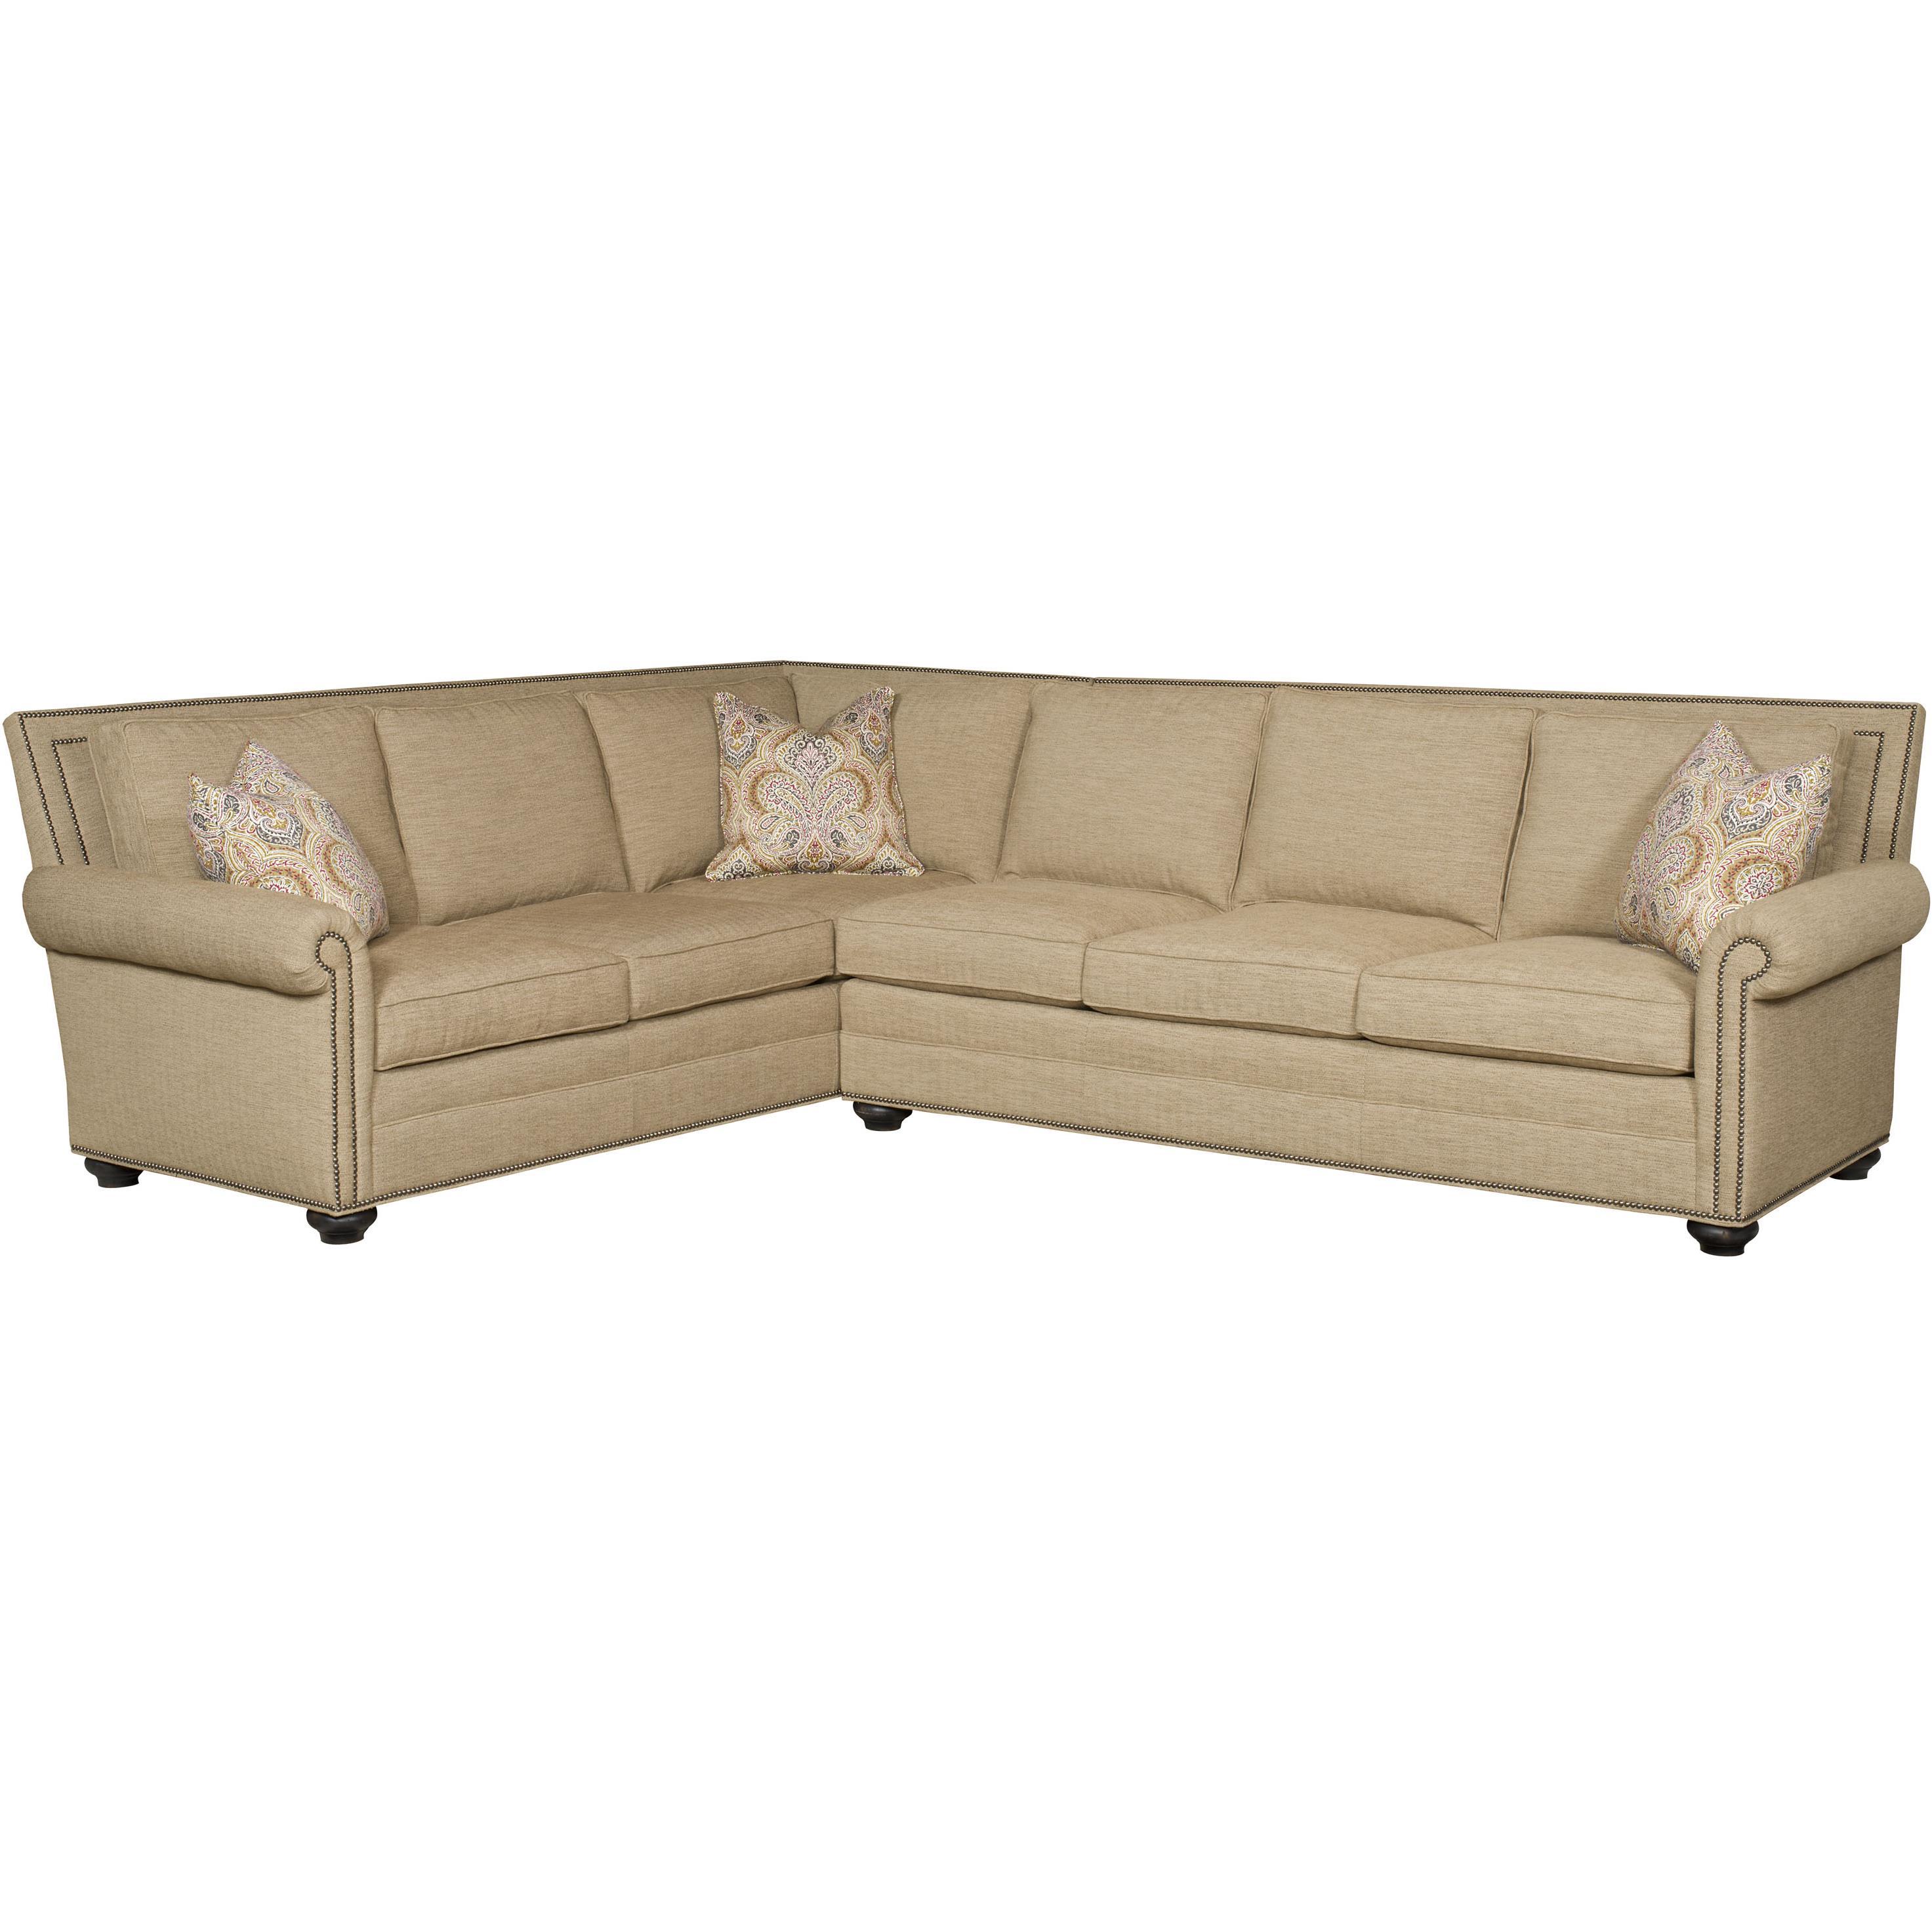 Vanguard Furniture SimpsonTraditional Sectional